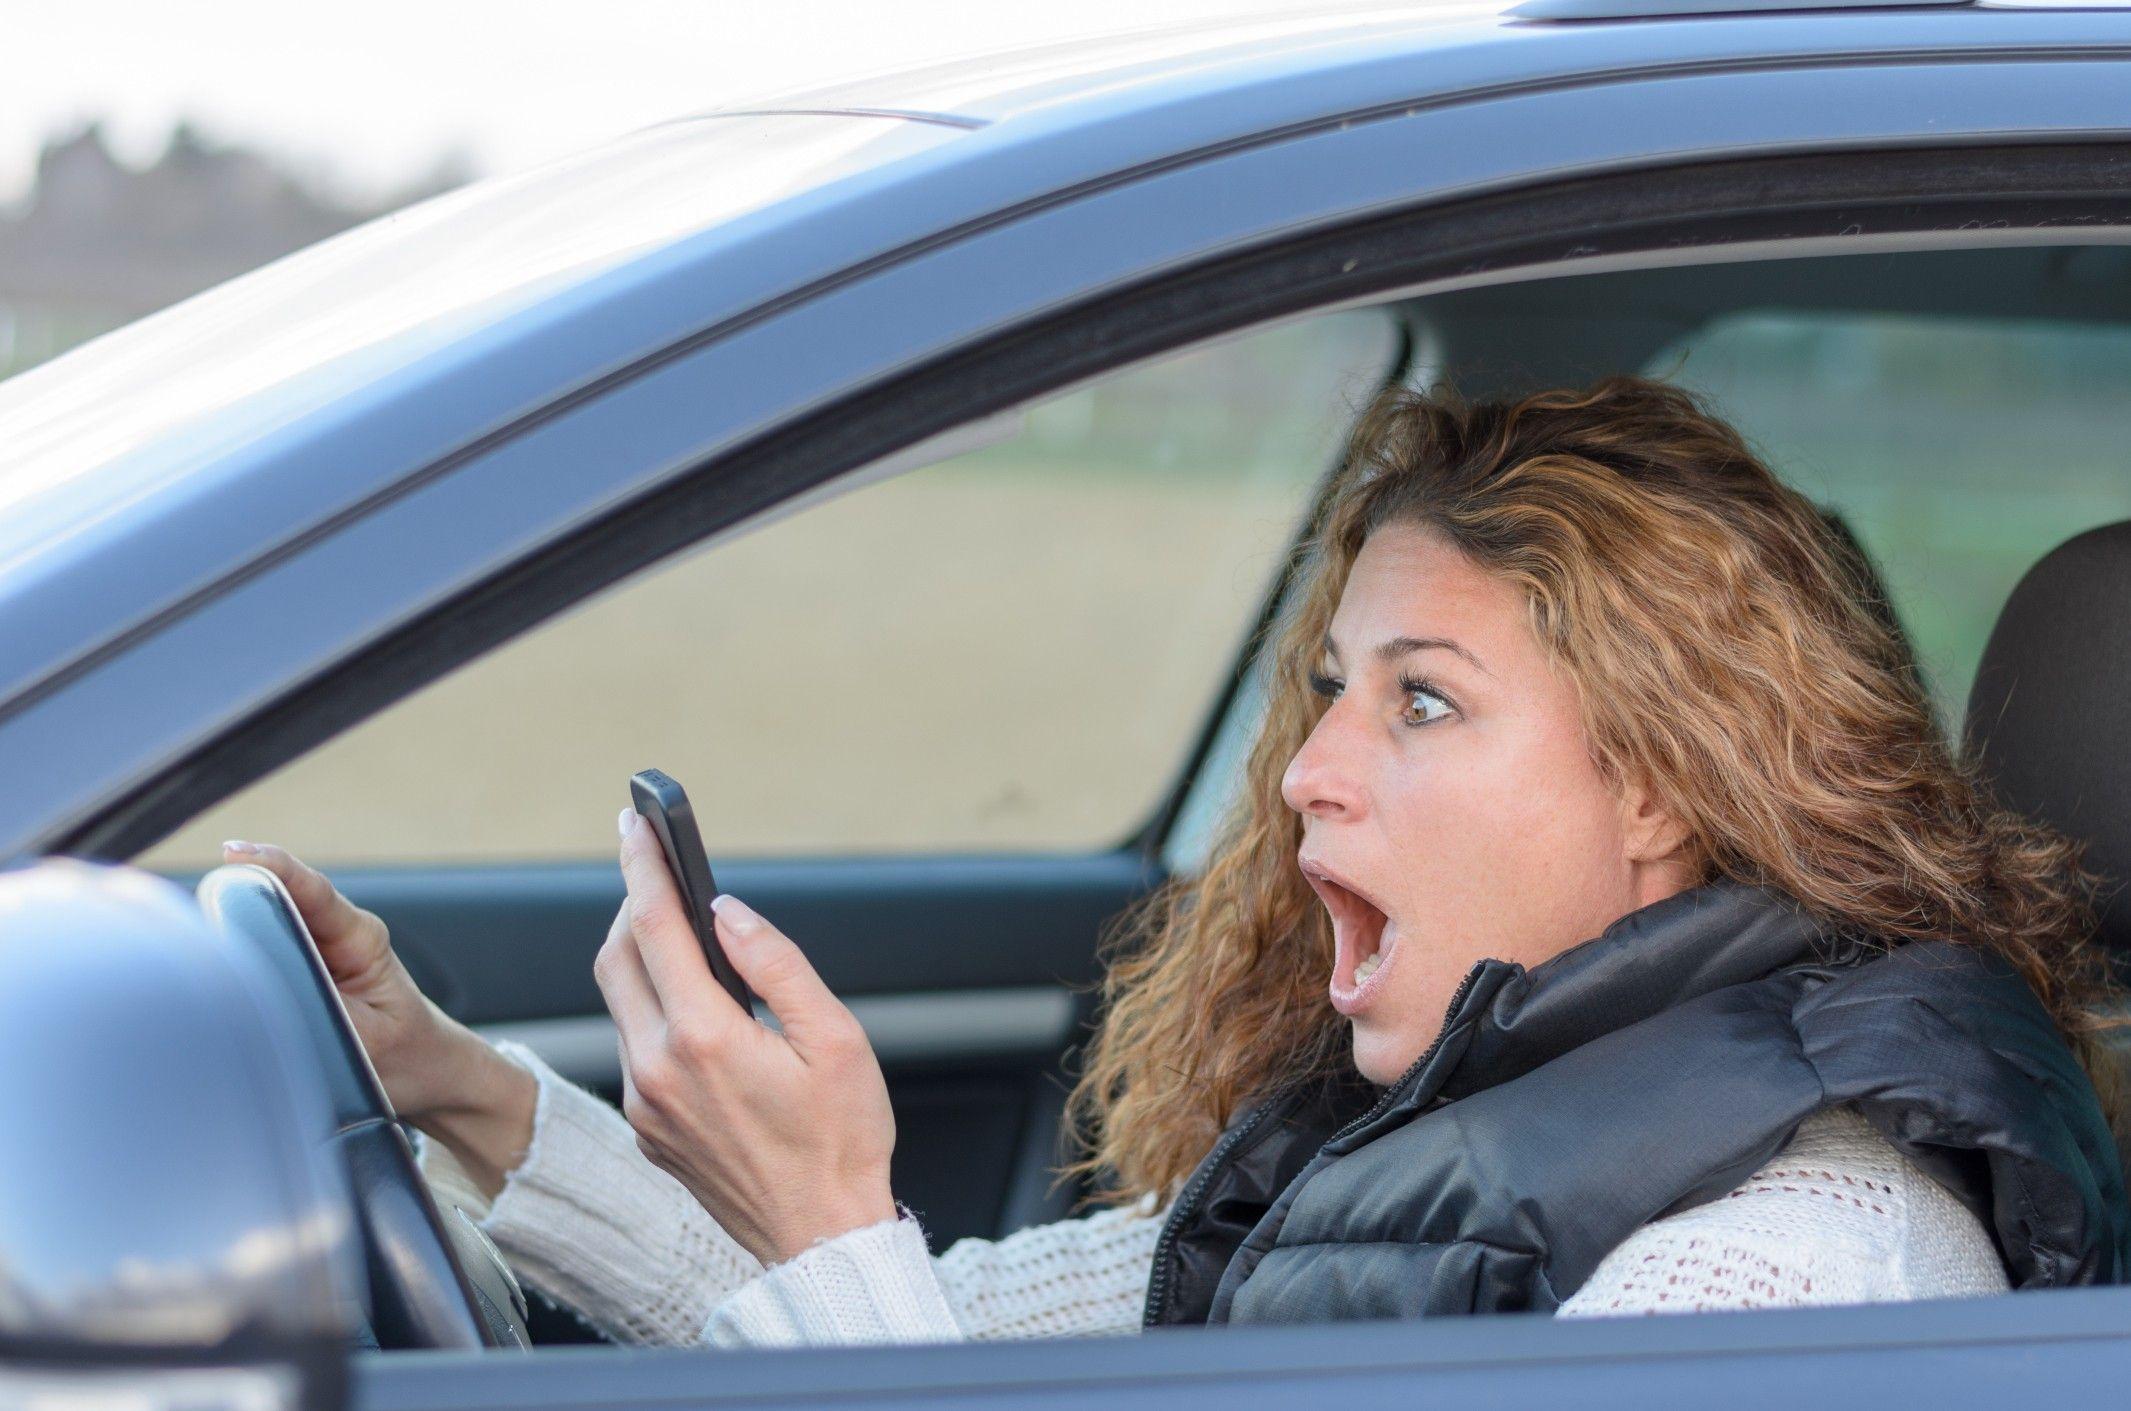 Baddriver 2 Bad Drivers Chiropractic Car Insurance